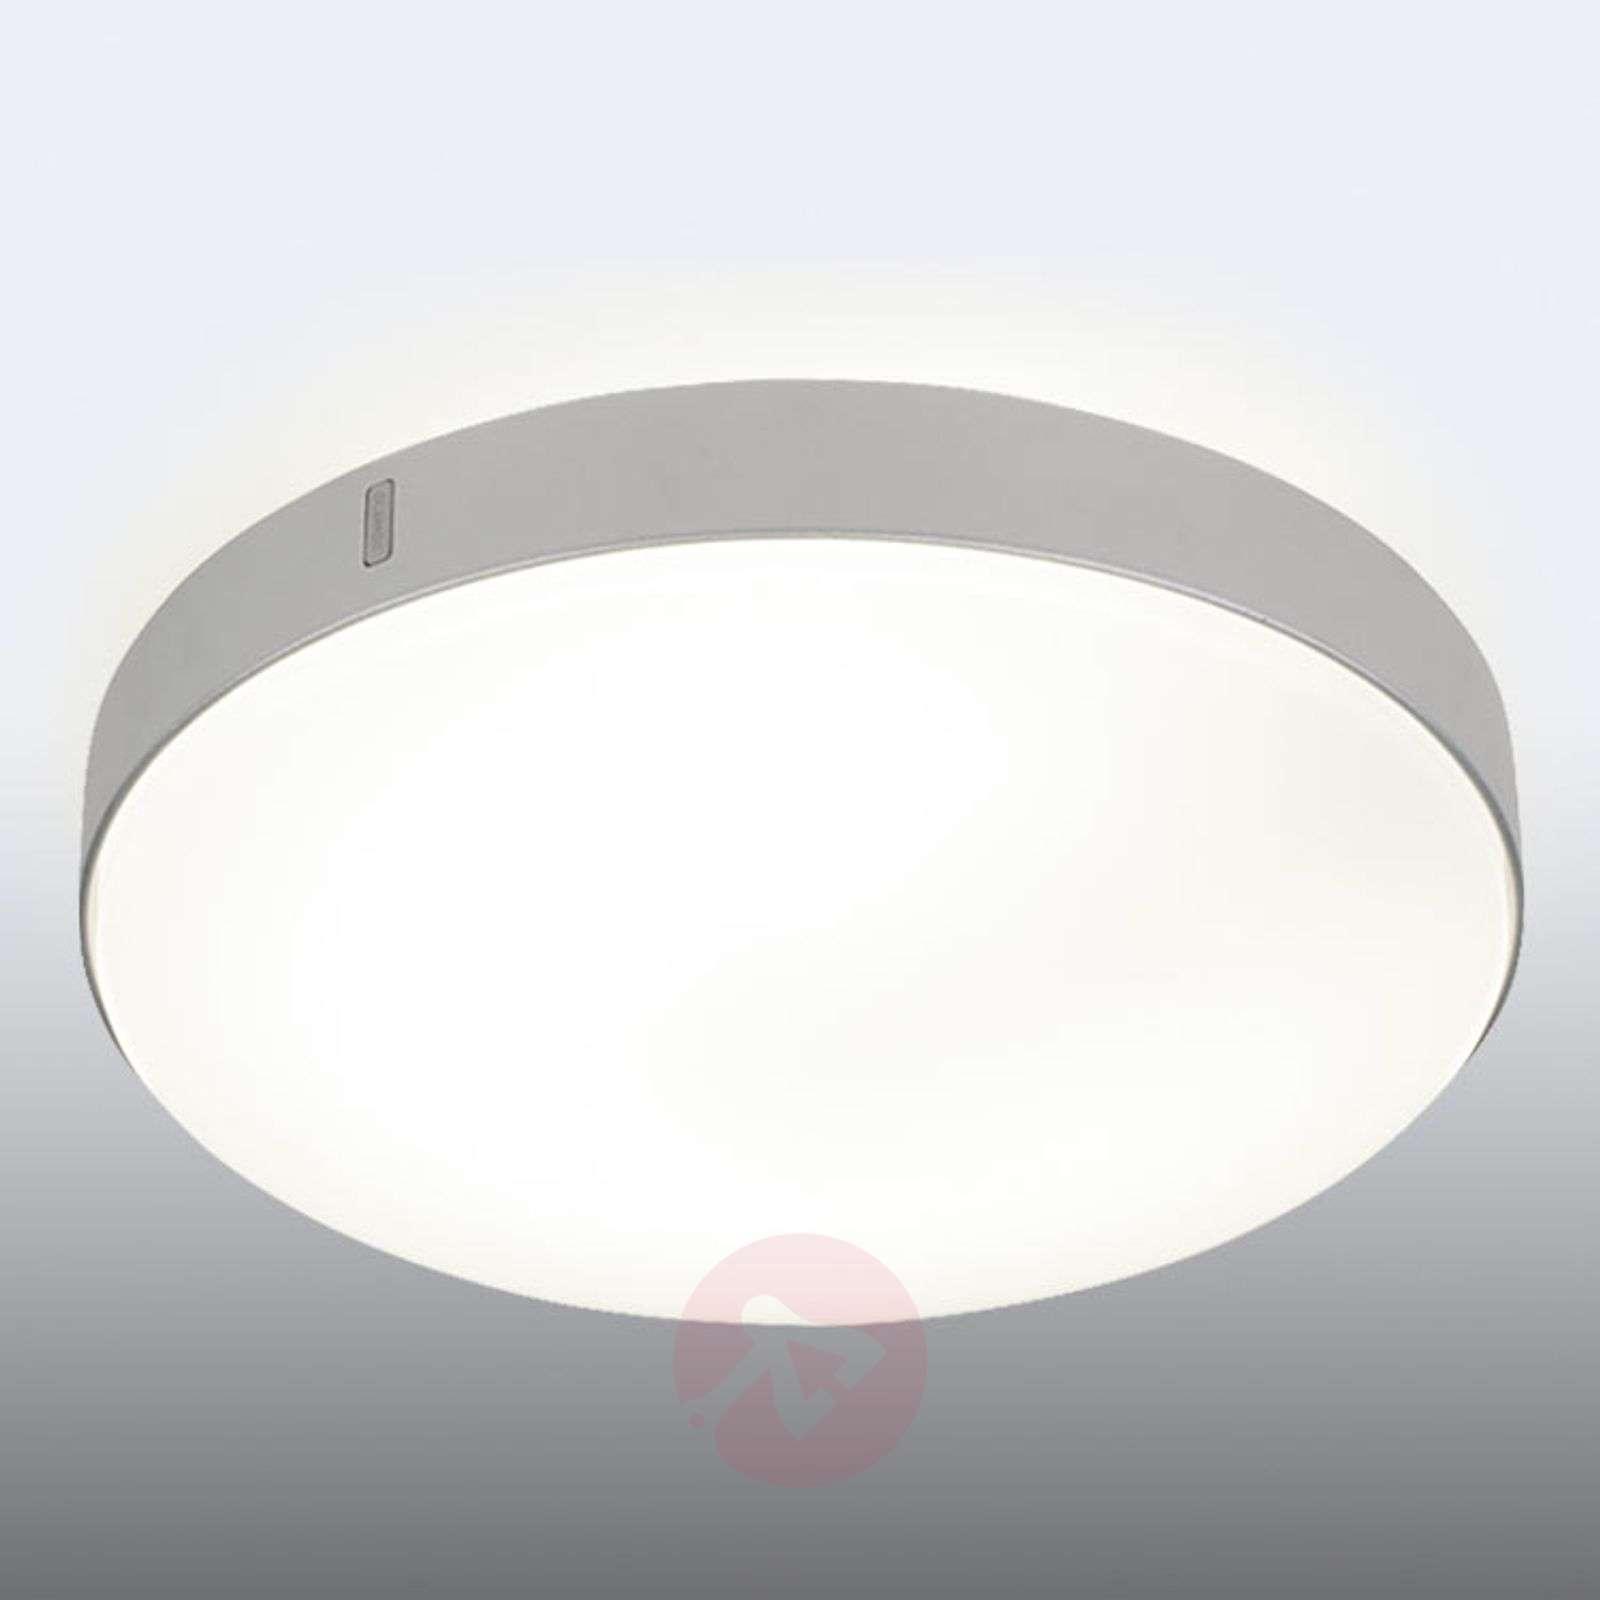 Pyöreä LED-kattolamppu A20-S420 2400HF 42 cm-6040217X-01